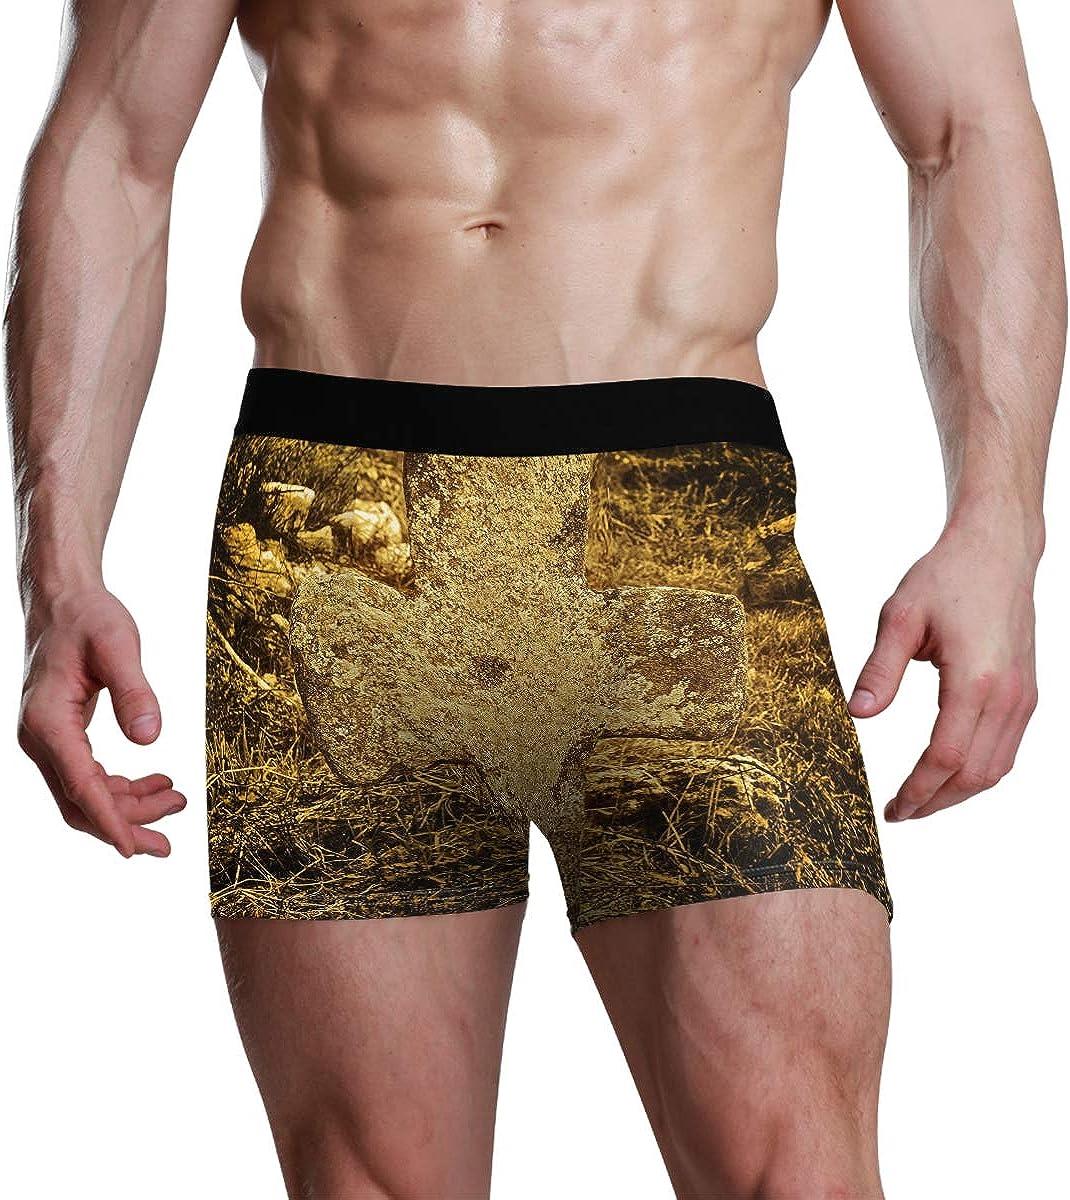 Mens Boxer Briefs Old Stone Cross Low Rise Trunks Underwear Breathable Bikini Boys